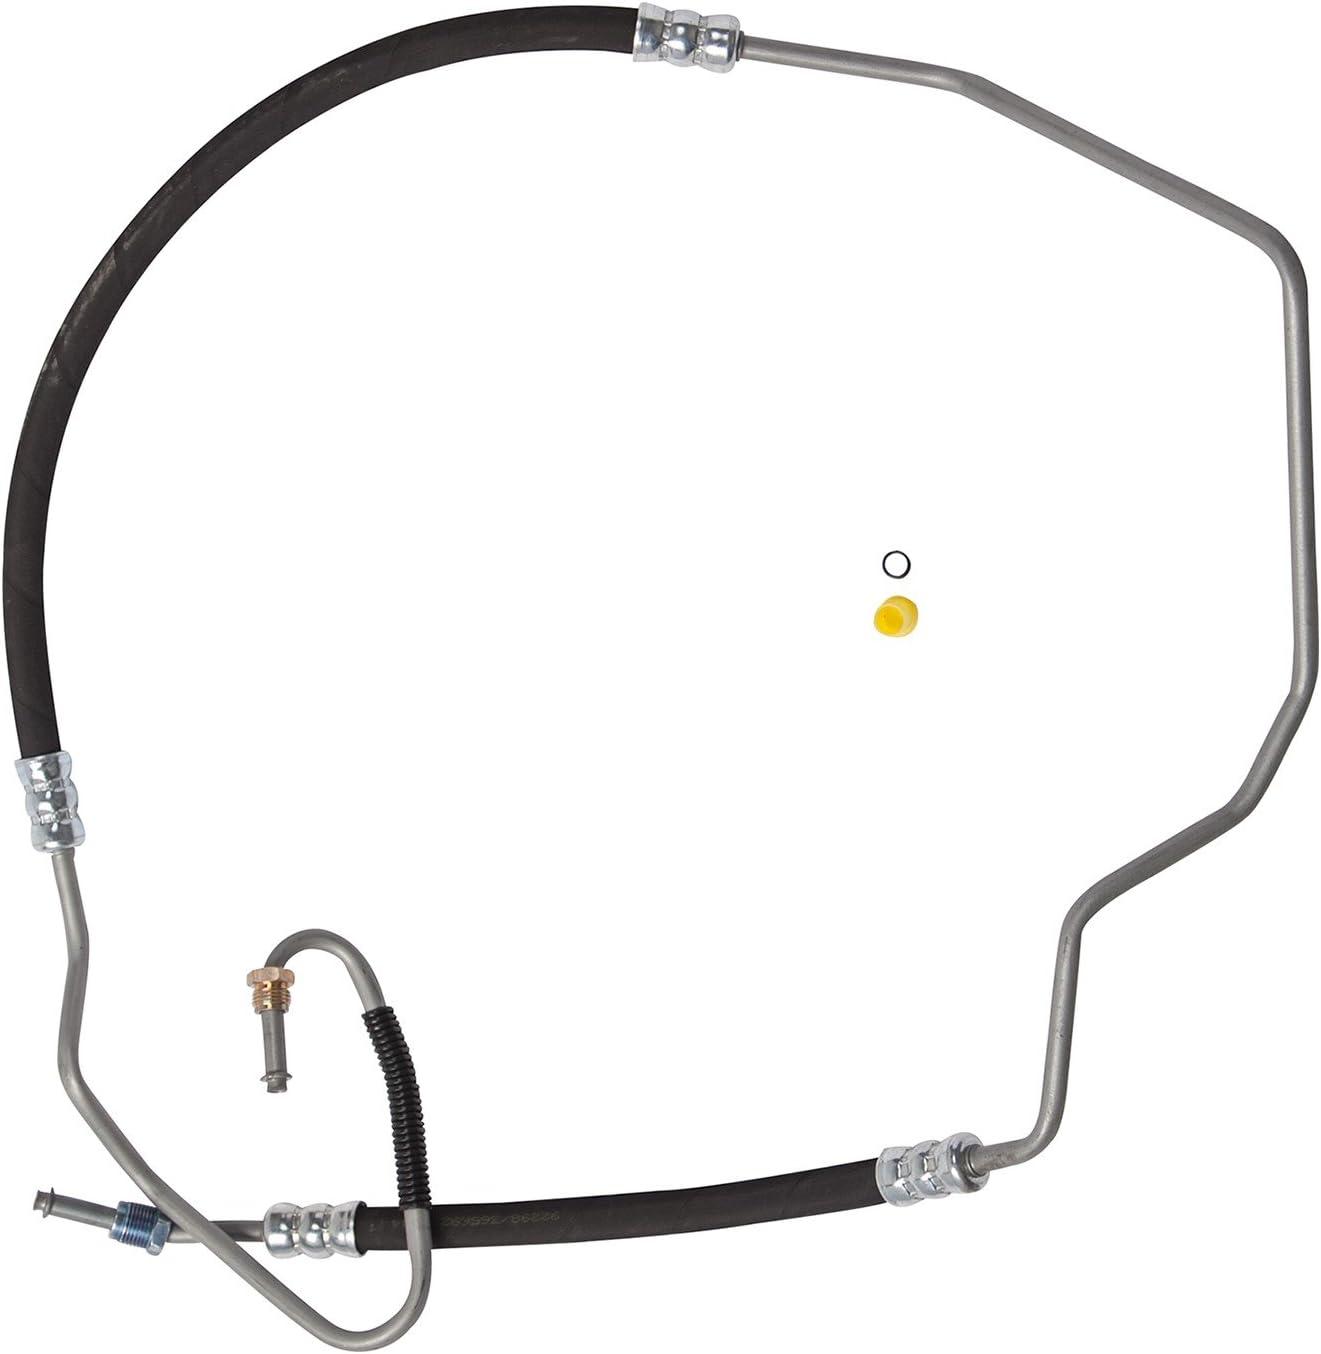 Edelmann 92298 Steering Pressure Hose